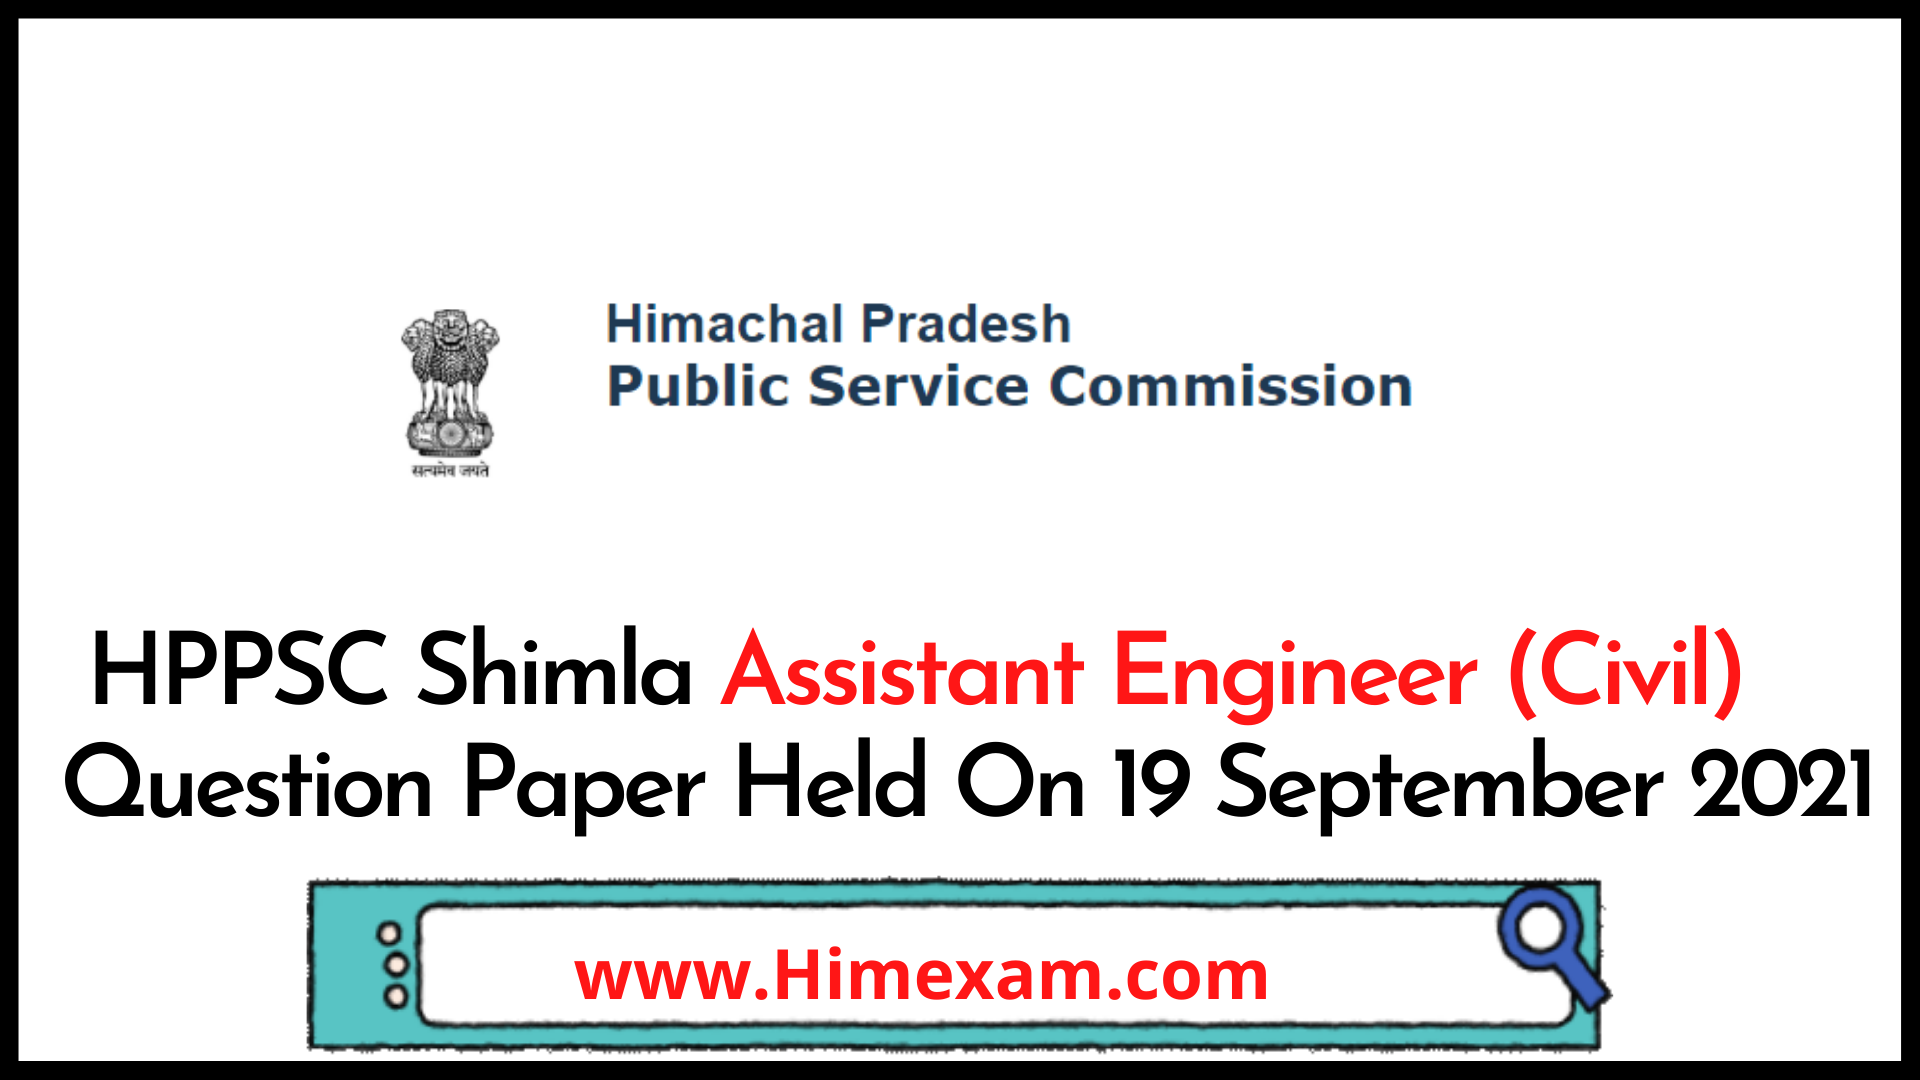 HPPSC Shimla Assistant Engineer (Civil) Question Paper Held On 19 September 2021